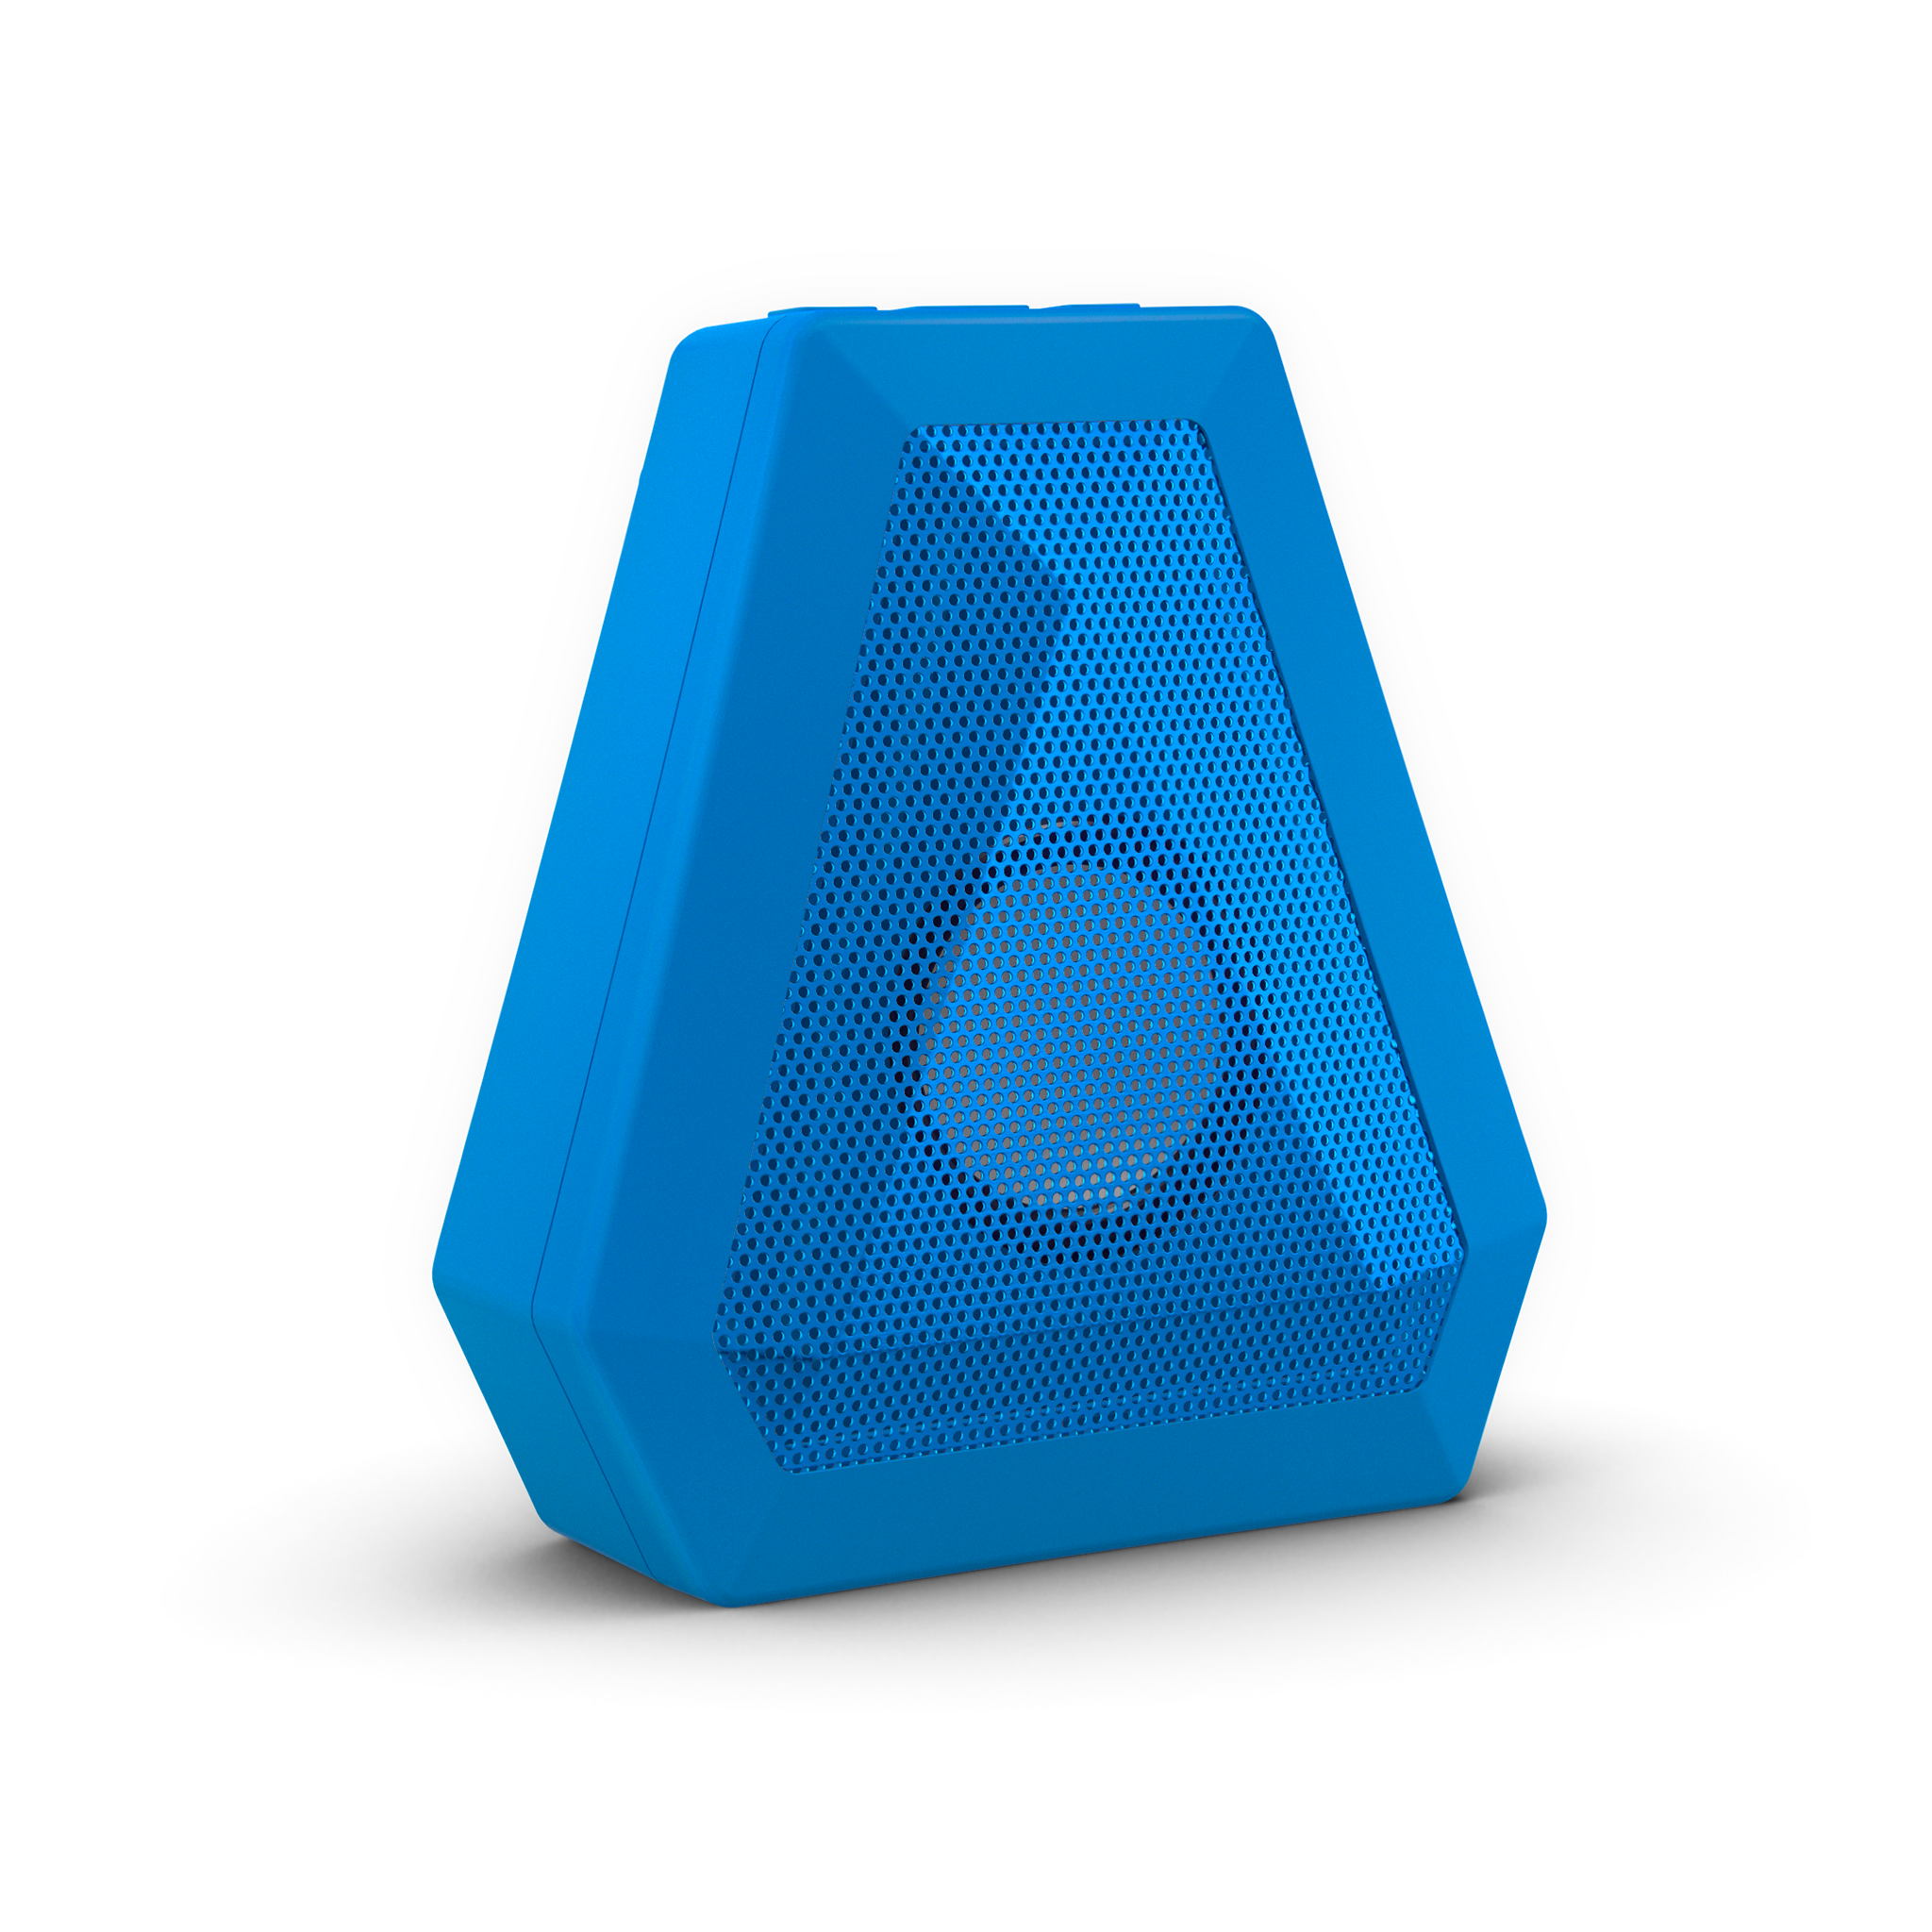 Blue triangle shaped boombotix speaker